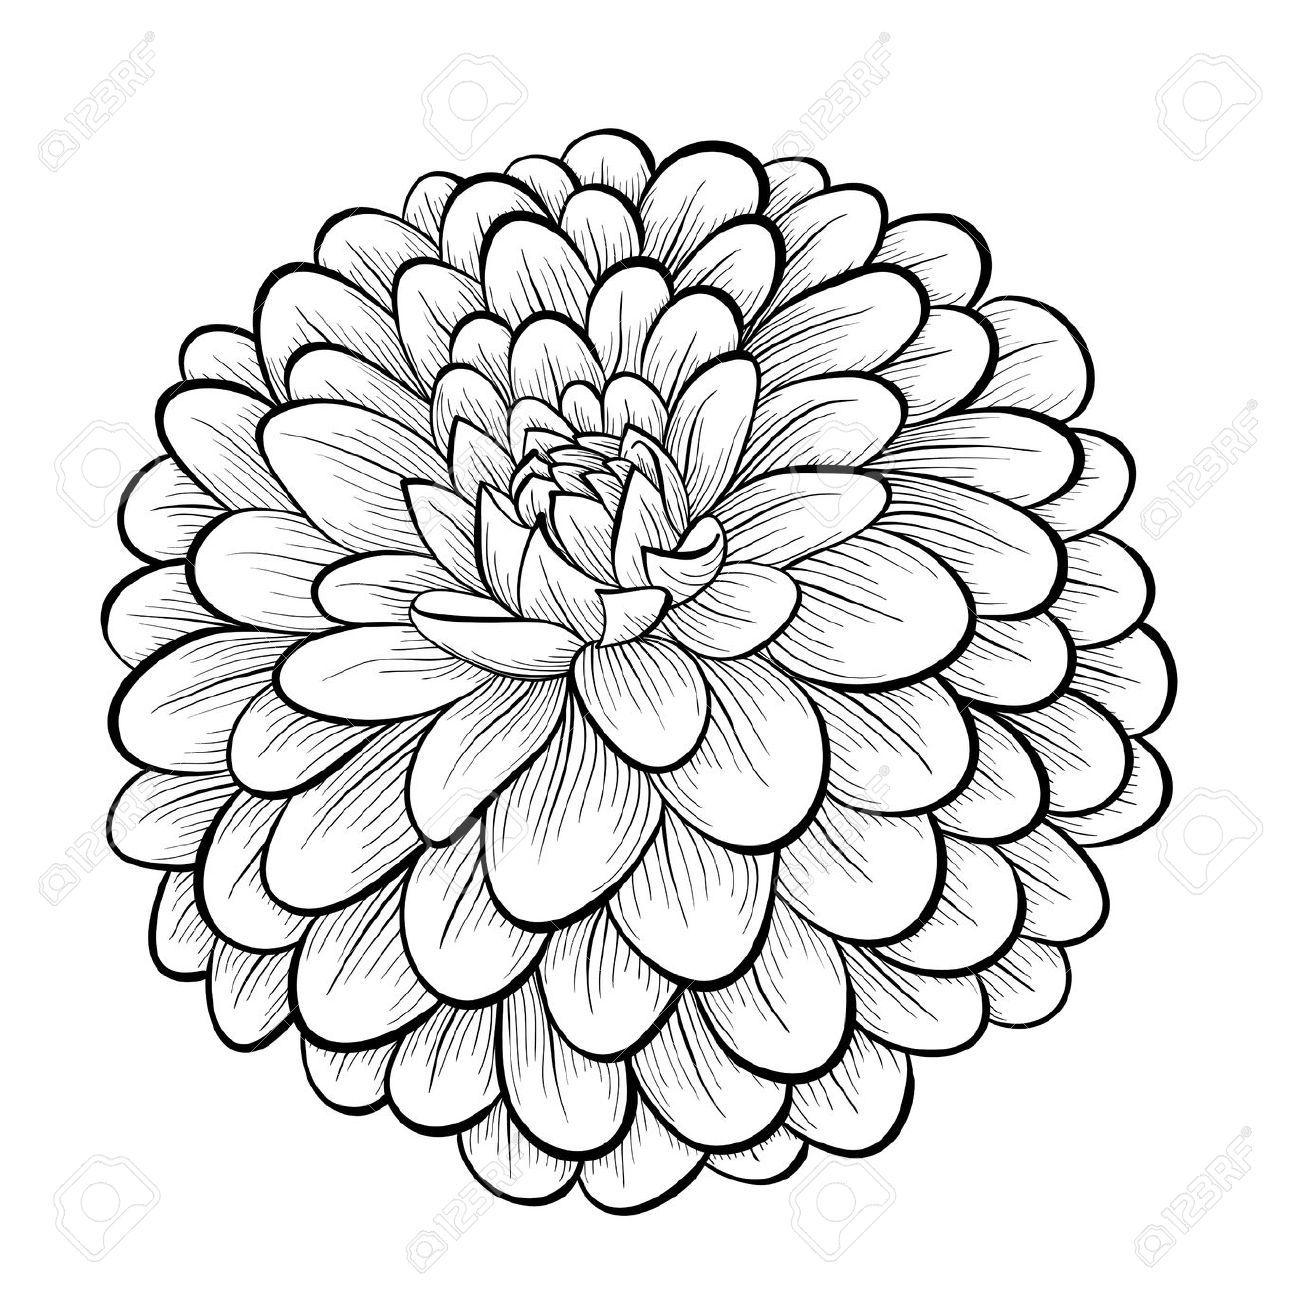 Svd 25951483 Beautiful Monochrome Black And White Dahlia Flower